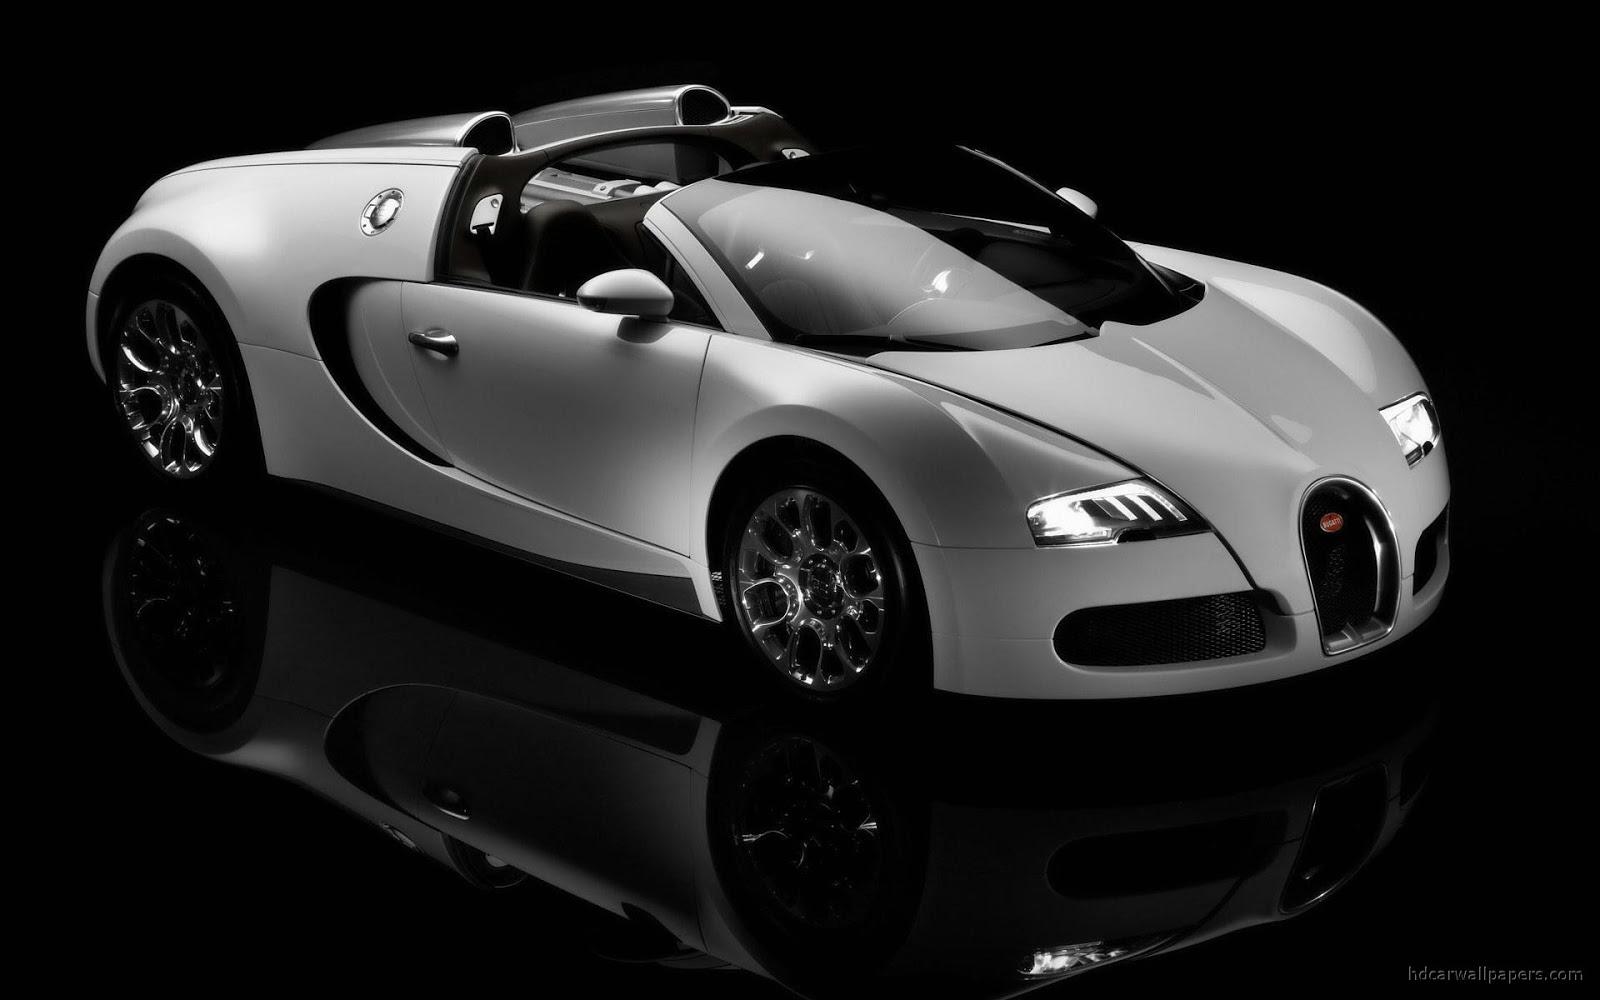 Hd Wallpapers Bugatti Veyron Hd Wallpapers